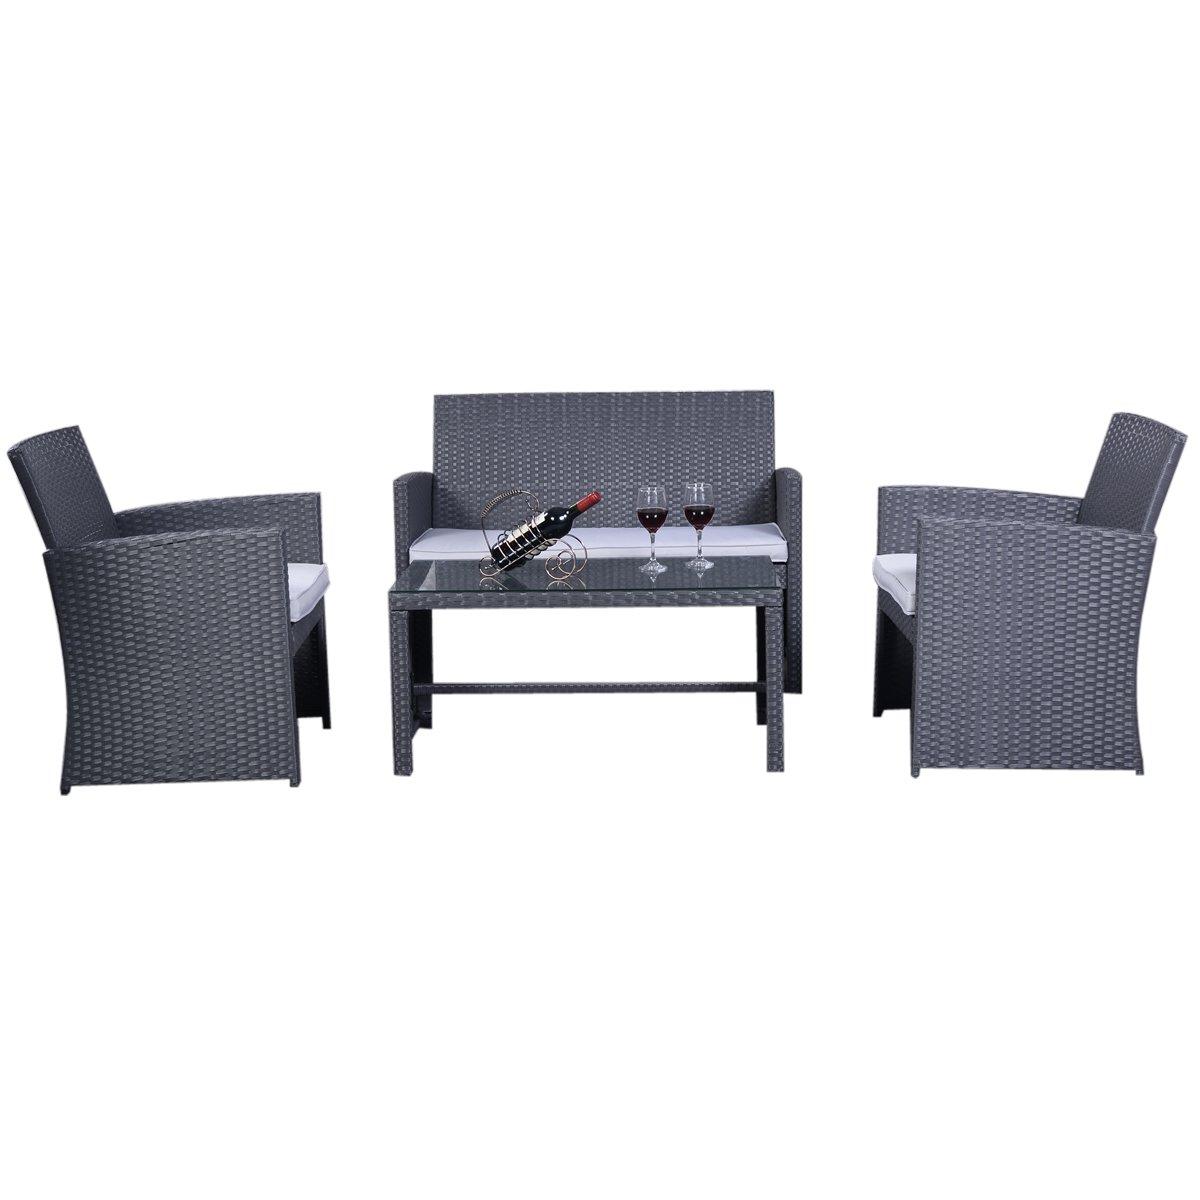 13tlg lounge set gartenm bel rattan set polyrattan sitzgruppe rattanm bel garnitur garten g nstig. Black Bedroom Furniture Sets. Home Design Ideas